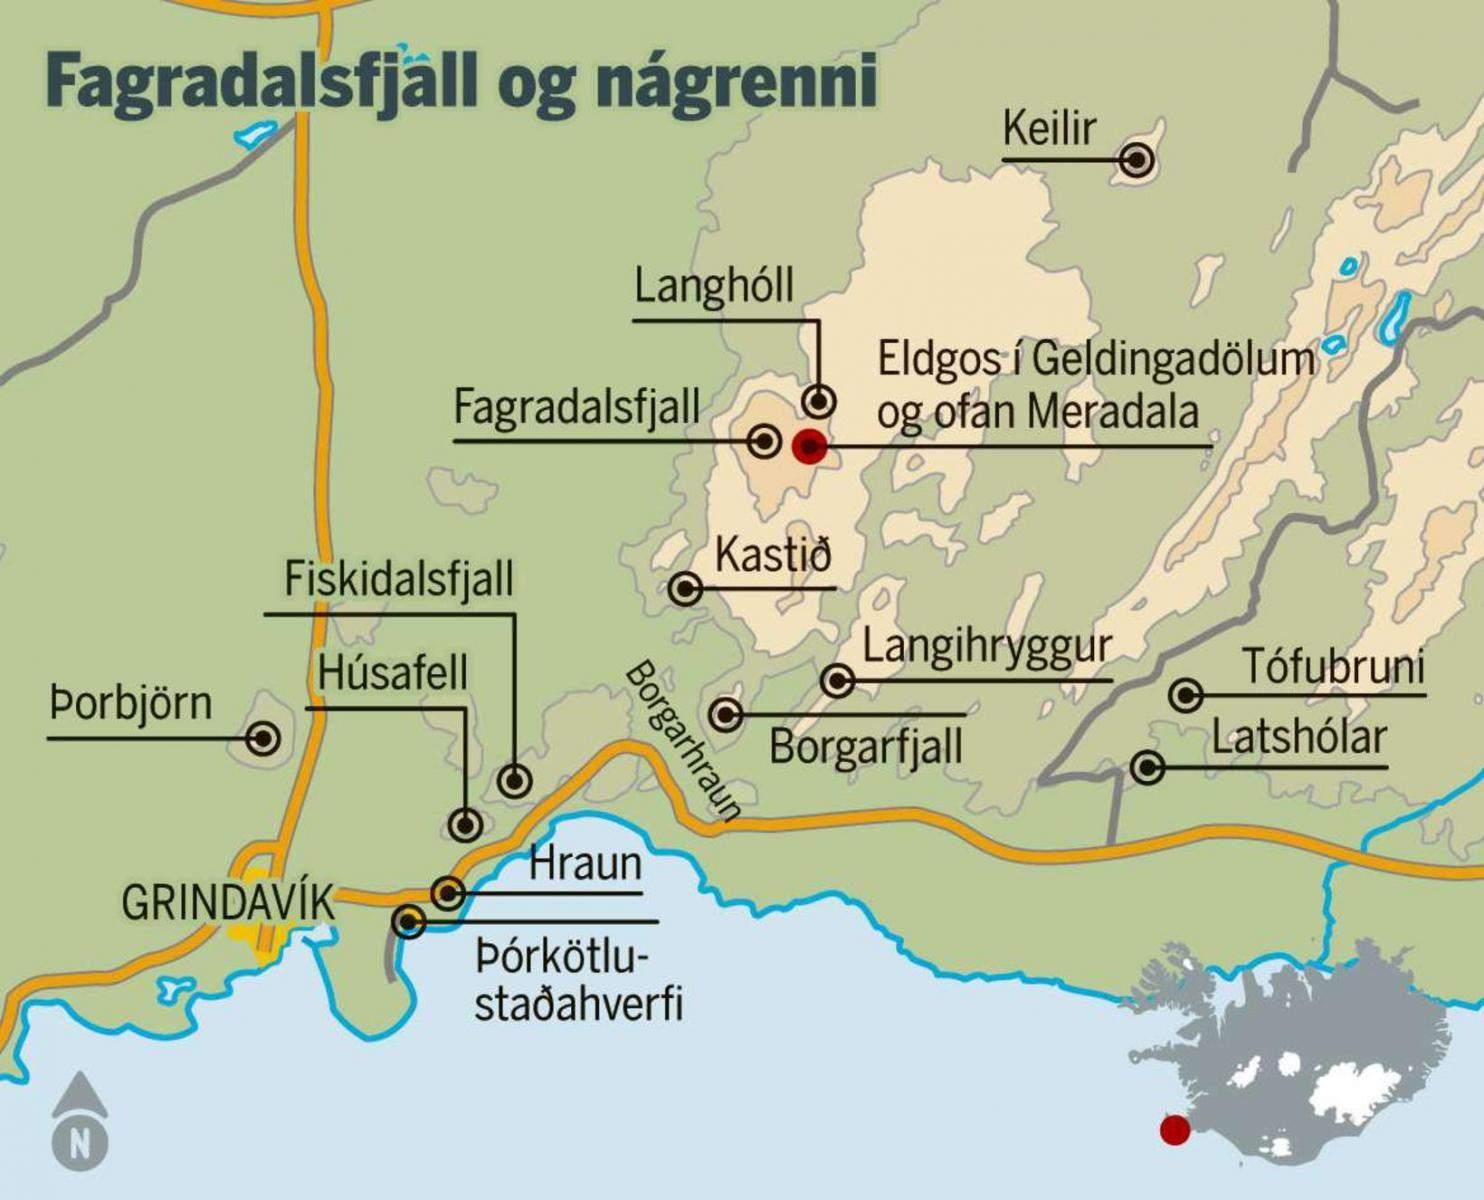 MBL-MAP of locations near the Eruption. Source https://www.mbl.is/mogginn/bladid/netgreinar/2021/04/08/banathufa_margra_vaskra_drengja/?_t=1618223939.3454254